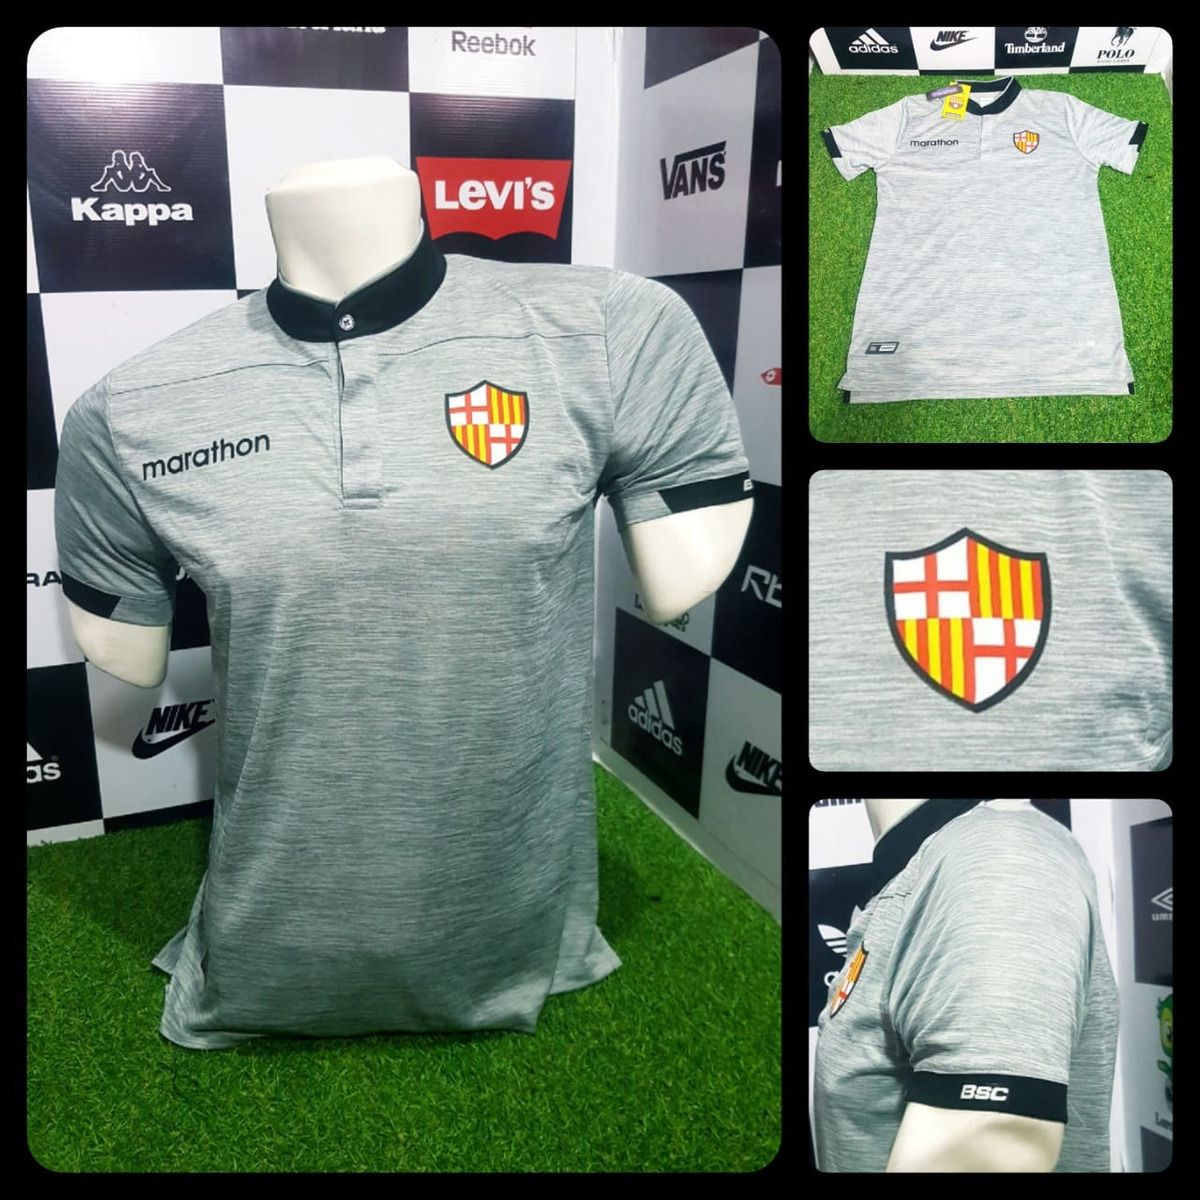 Camiseta 2019 Barcelona Sporting Club De Ecuador Bsc Ídolo D - U S ... 61c428be4a9